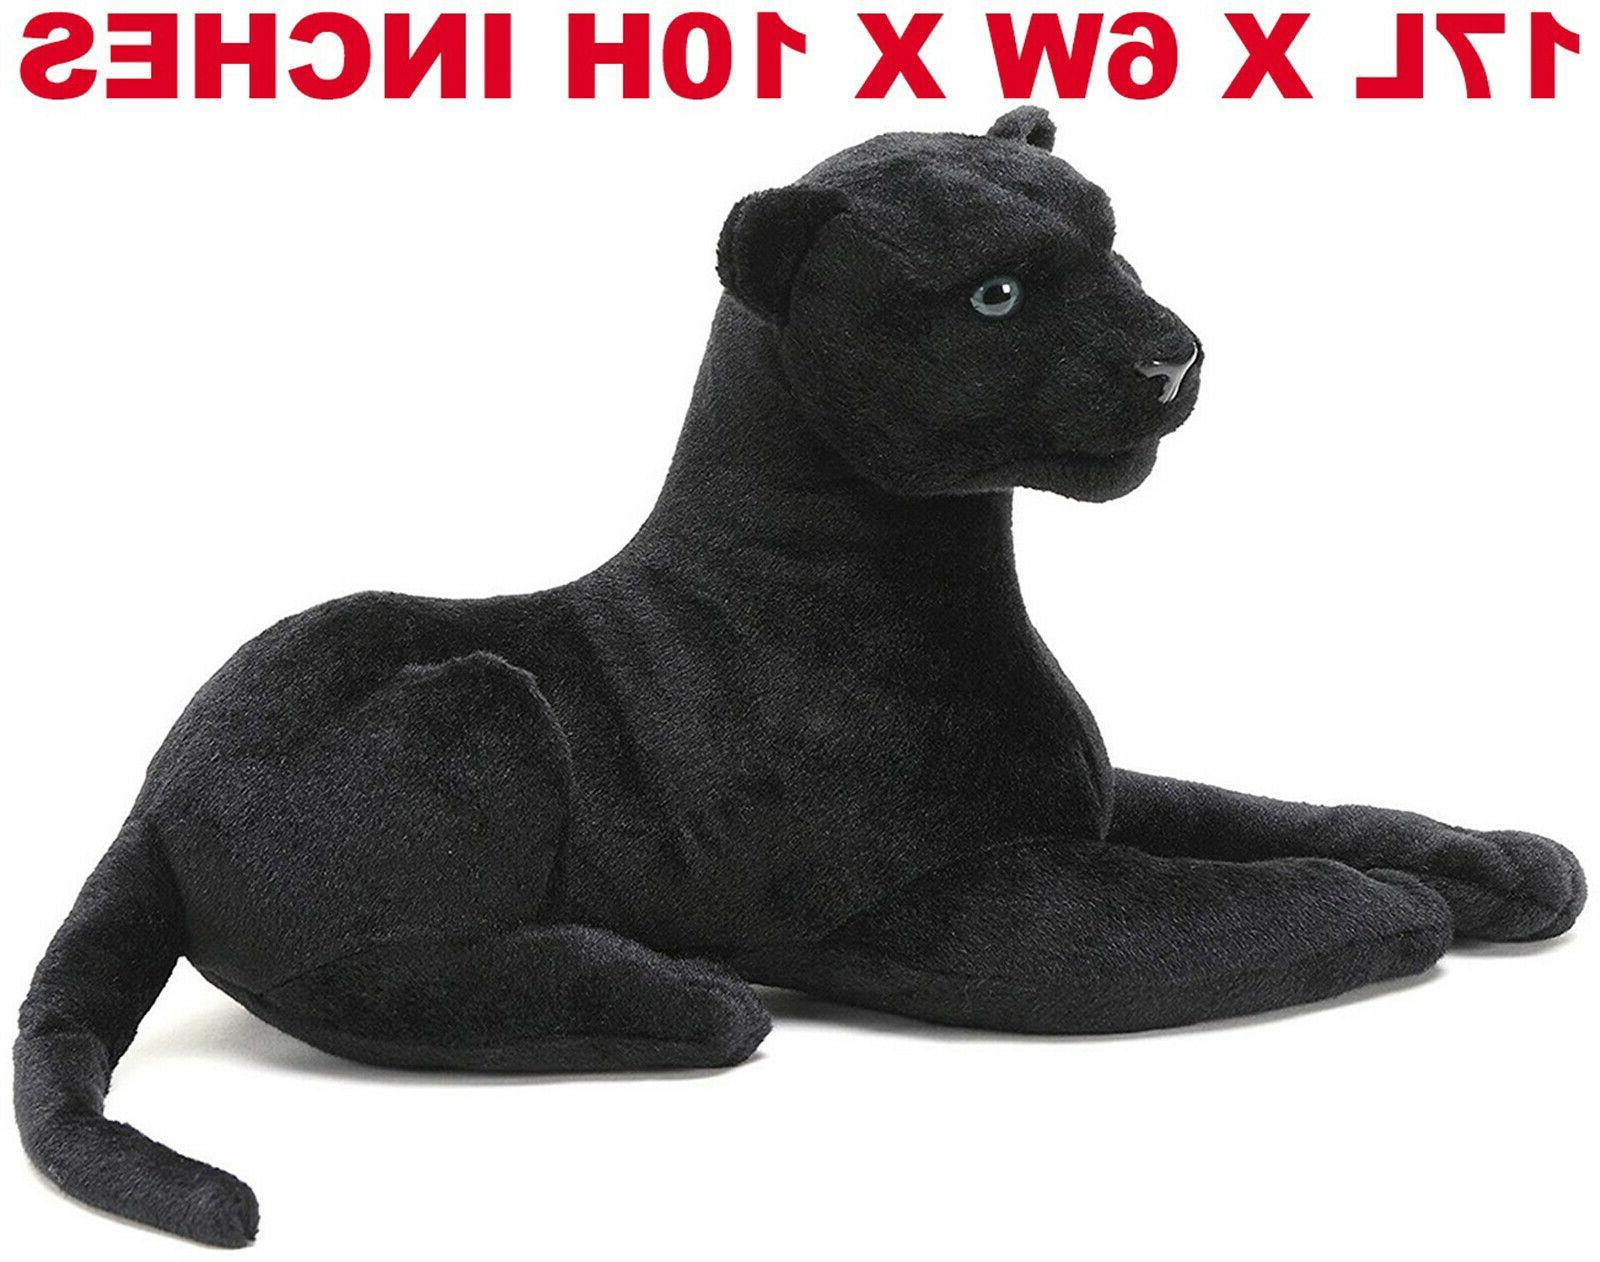 realistic black panther pet plush kids